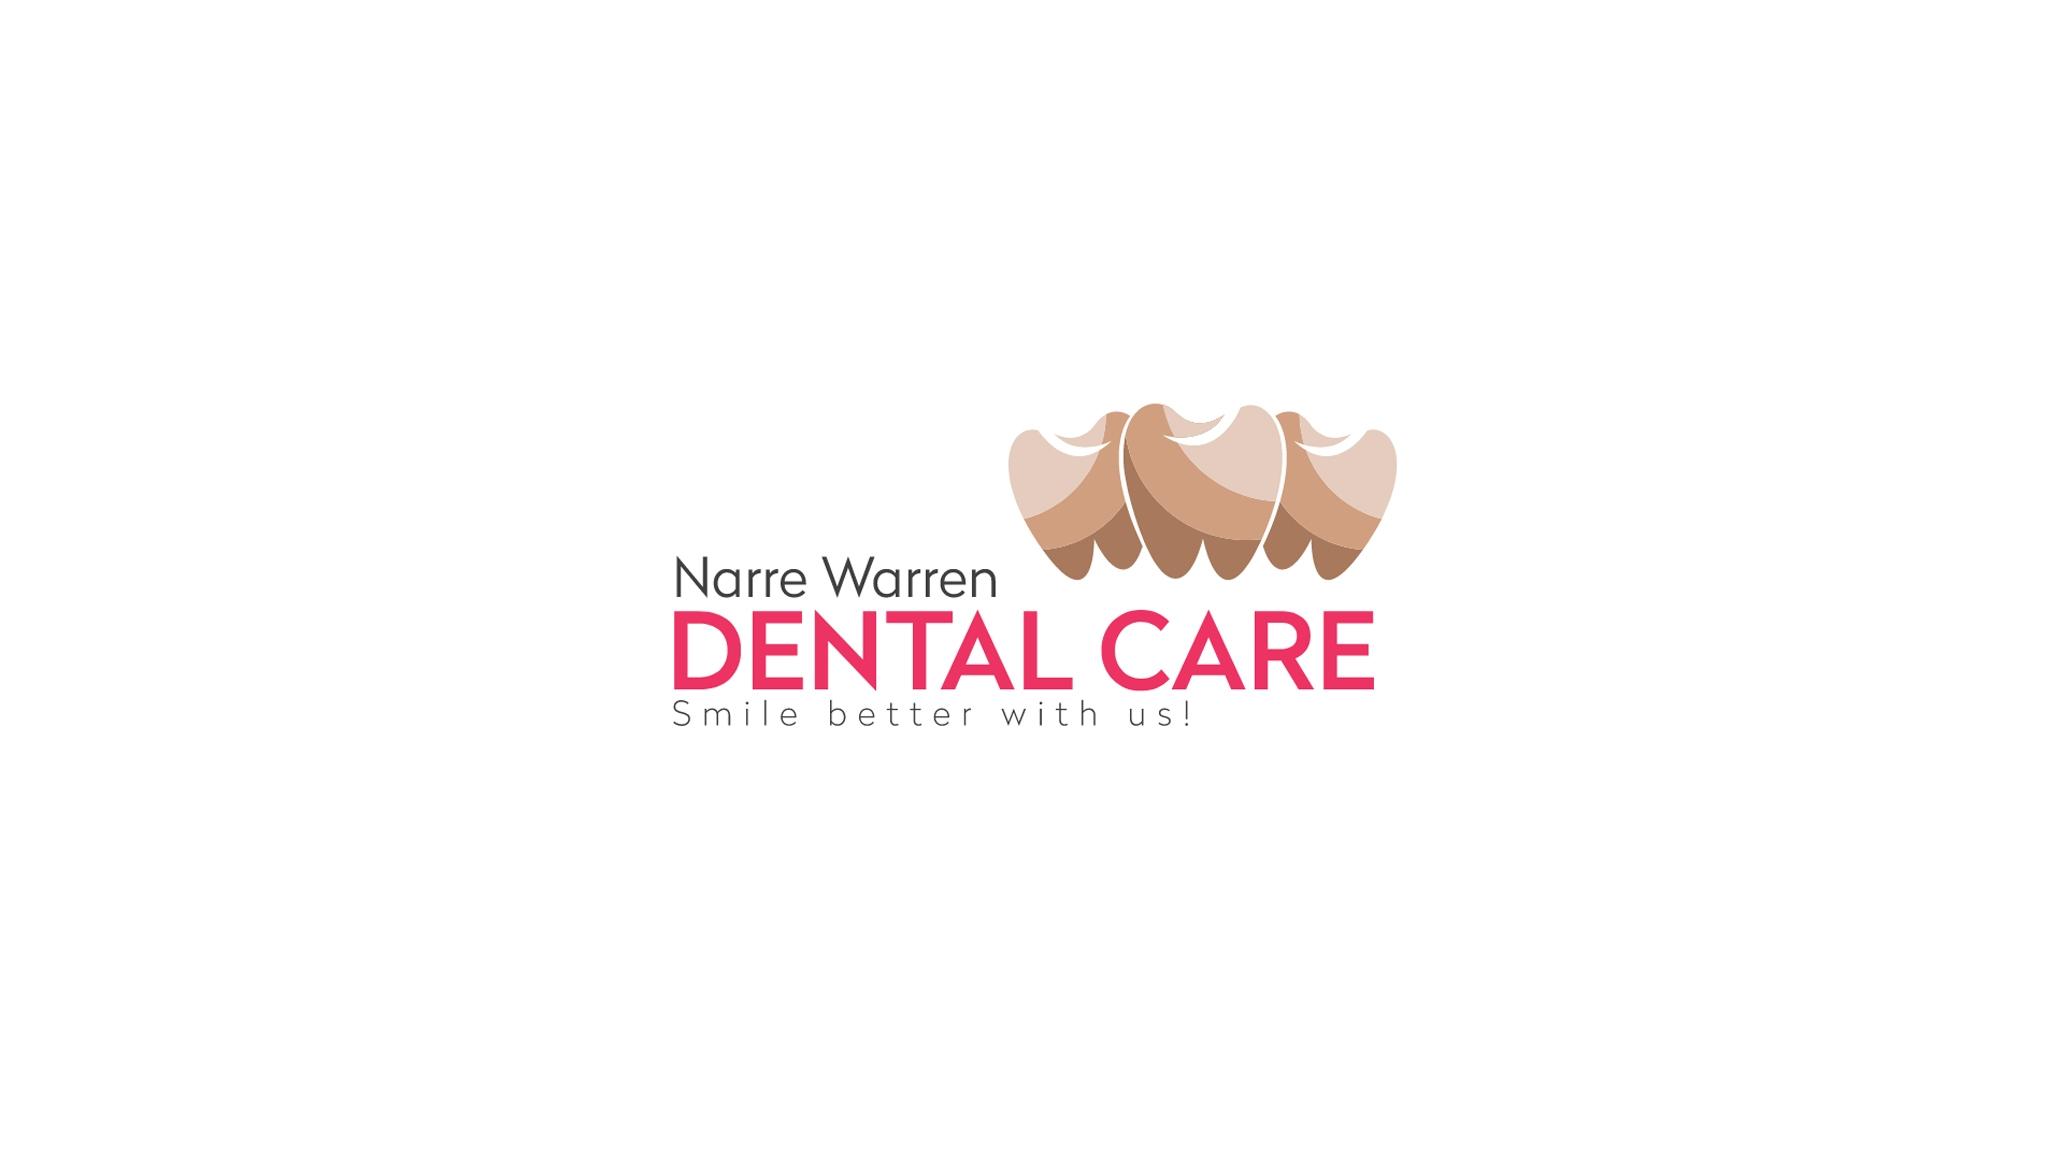 Narre Warren Dental Care (@narrewarrendentalcare) Cover Image